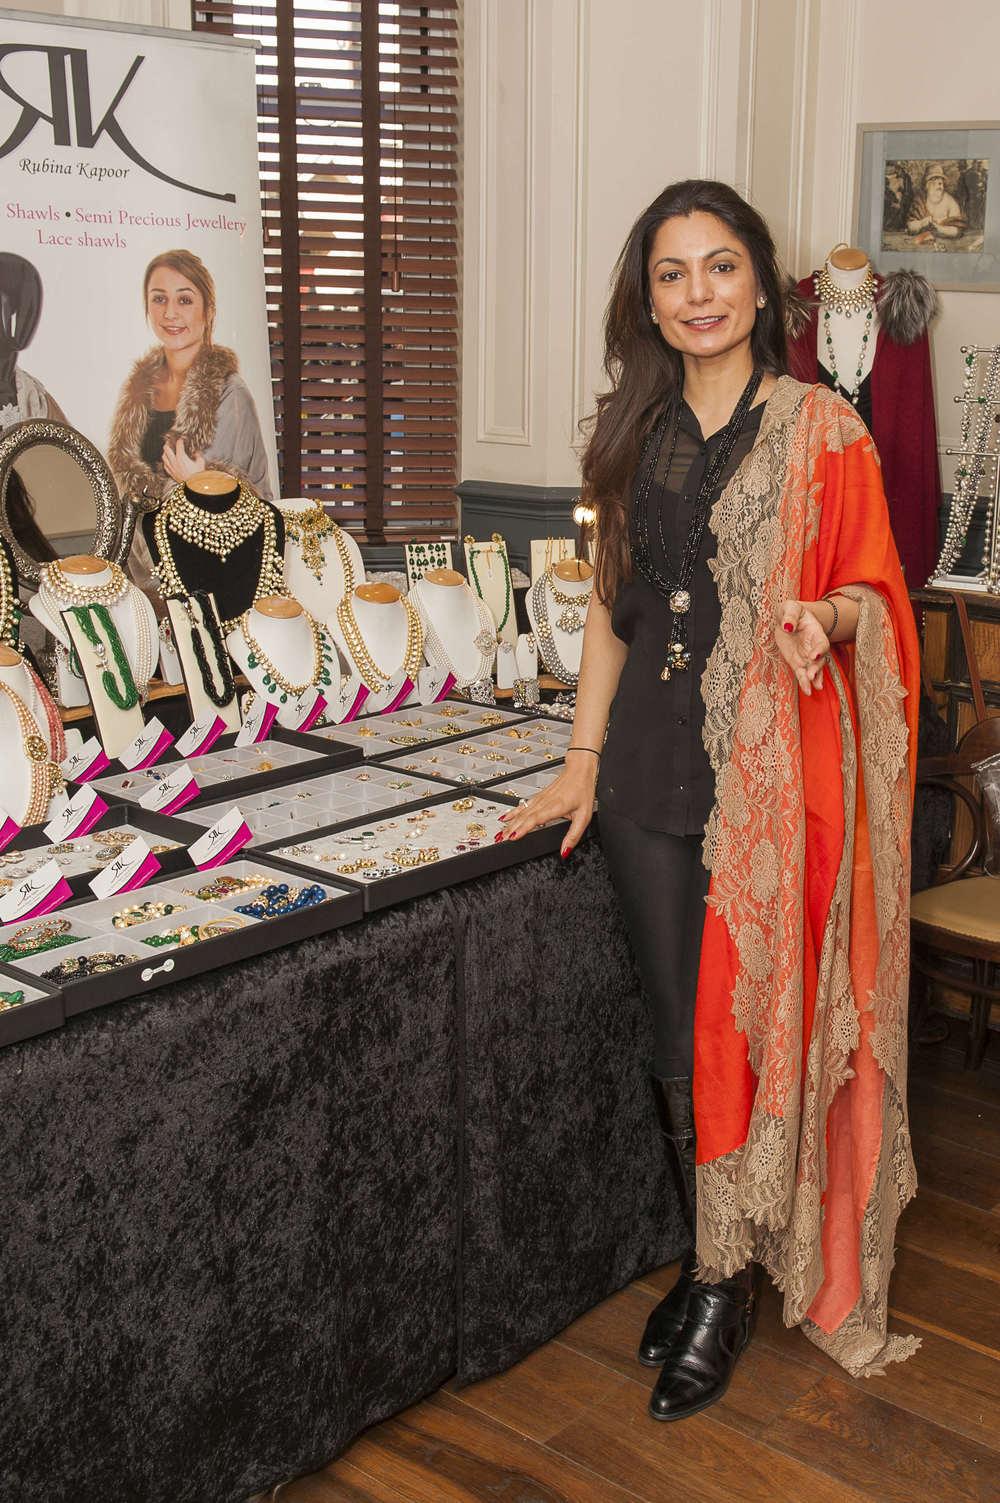 Rubina Kapoor.jpg